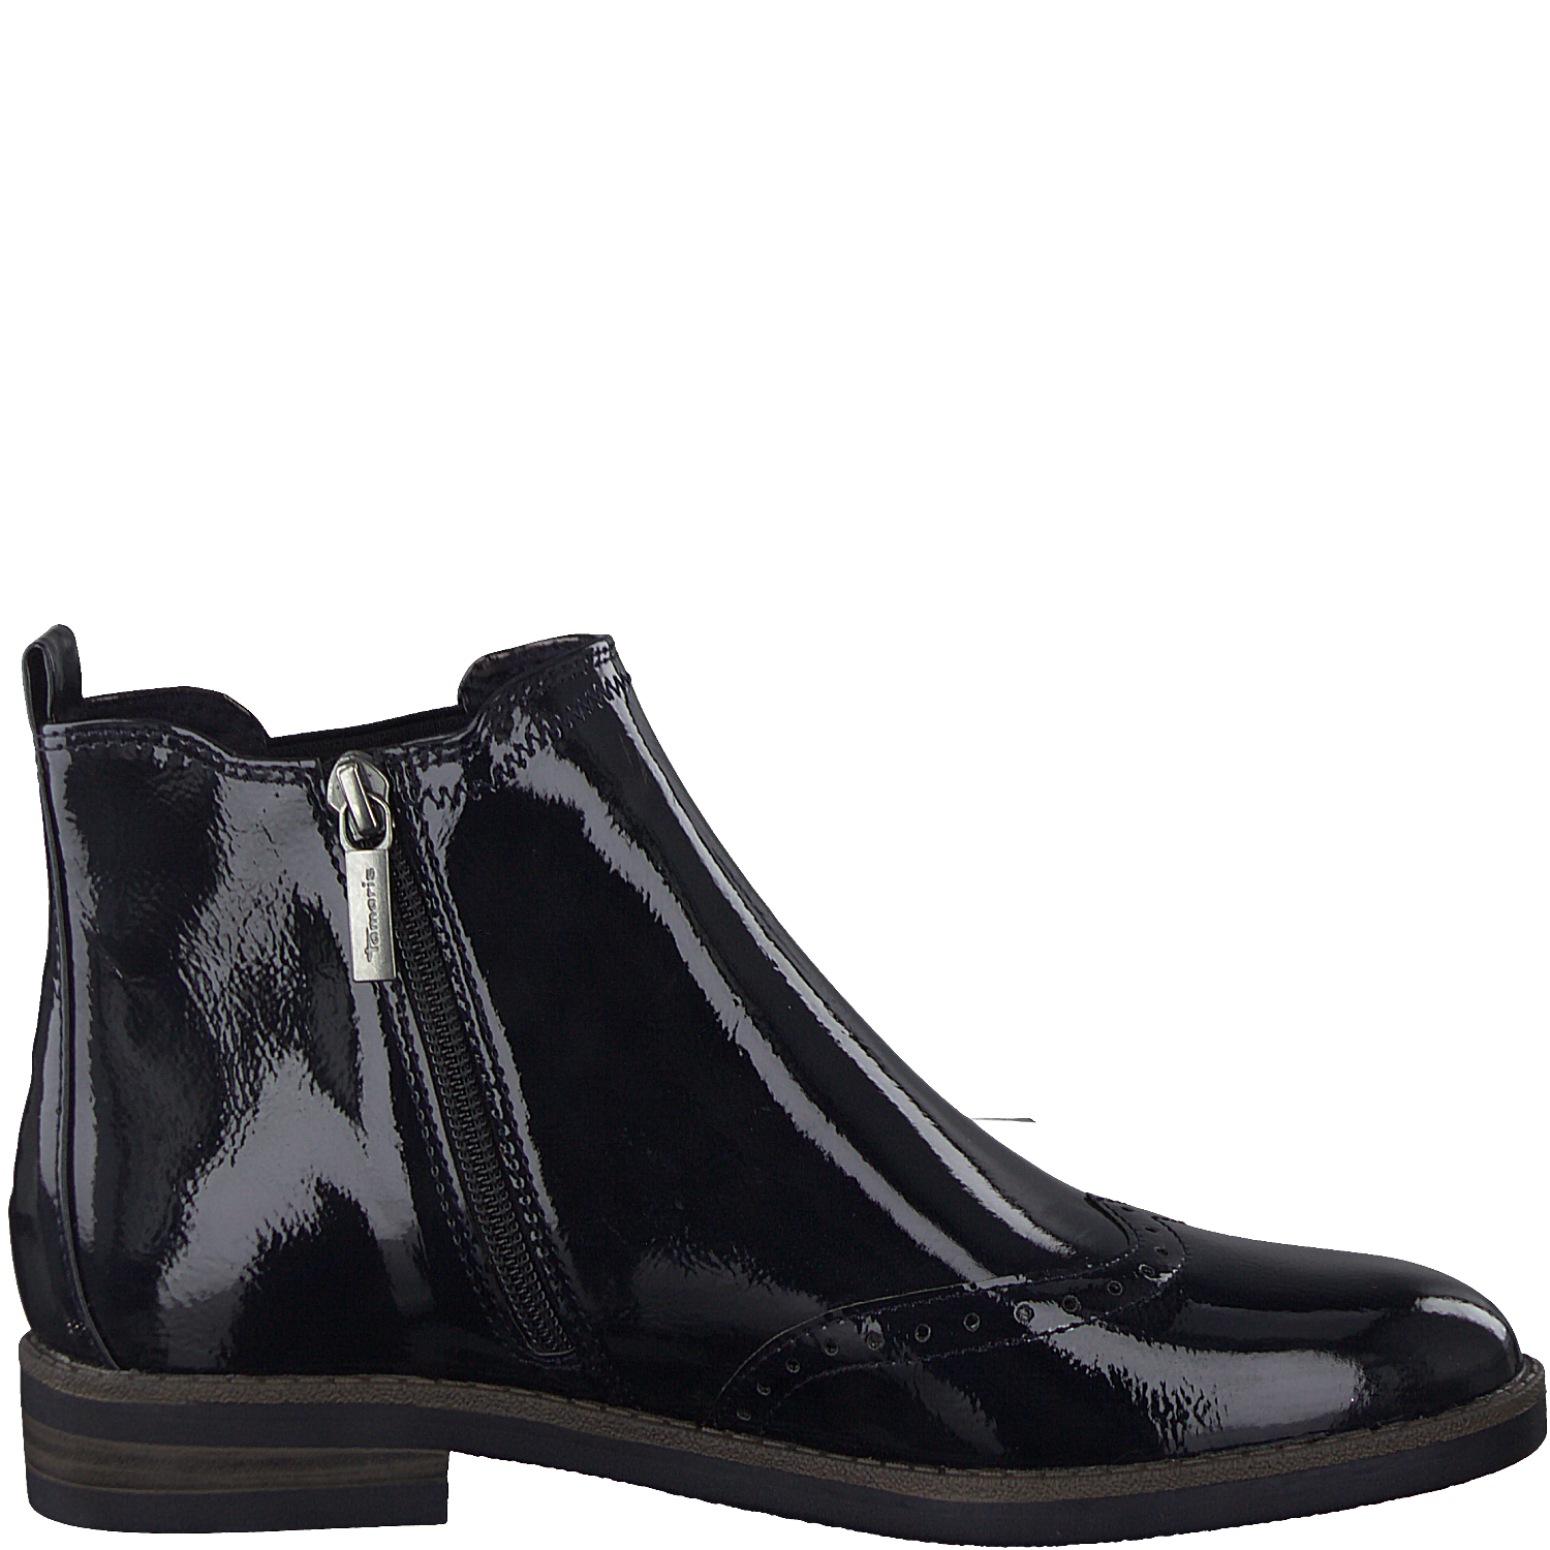 Tamaris Damen 1 25313 23 Stiefeletten Chelsea Boots Lack